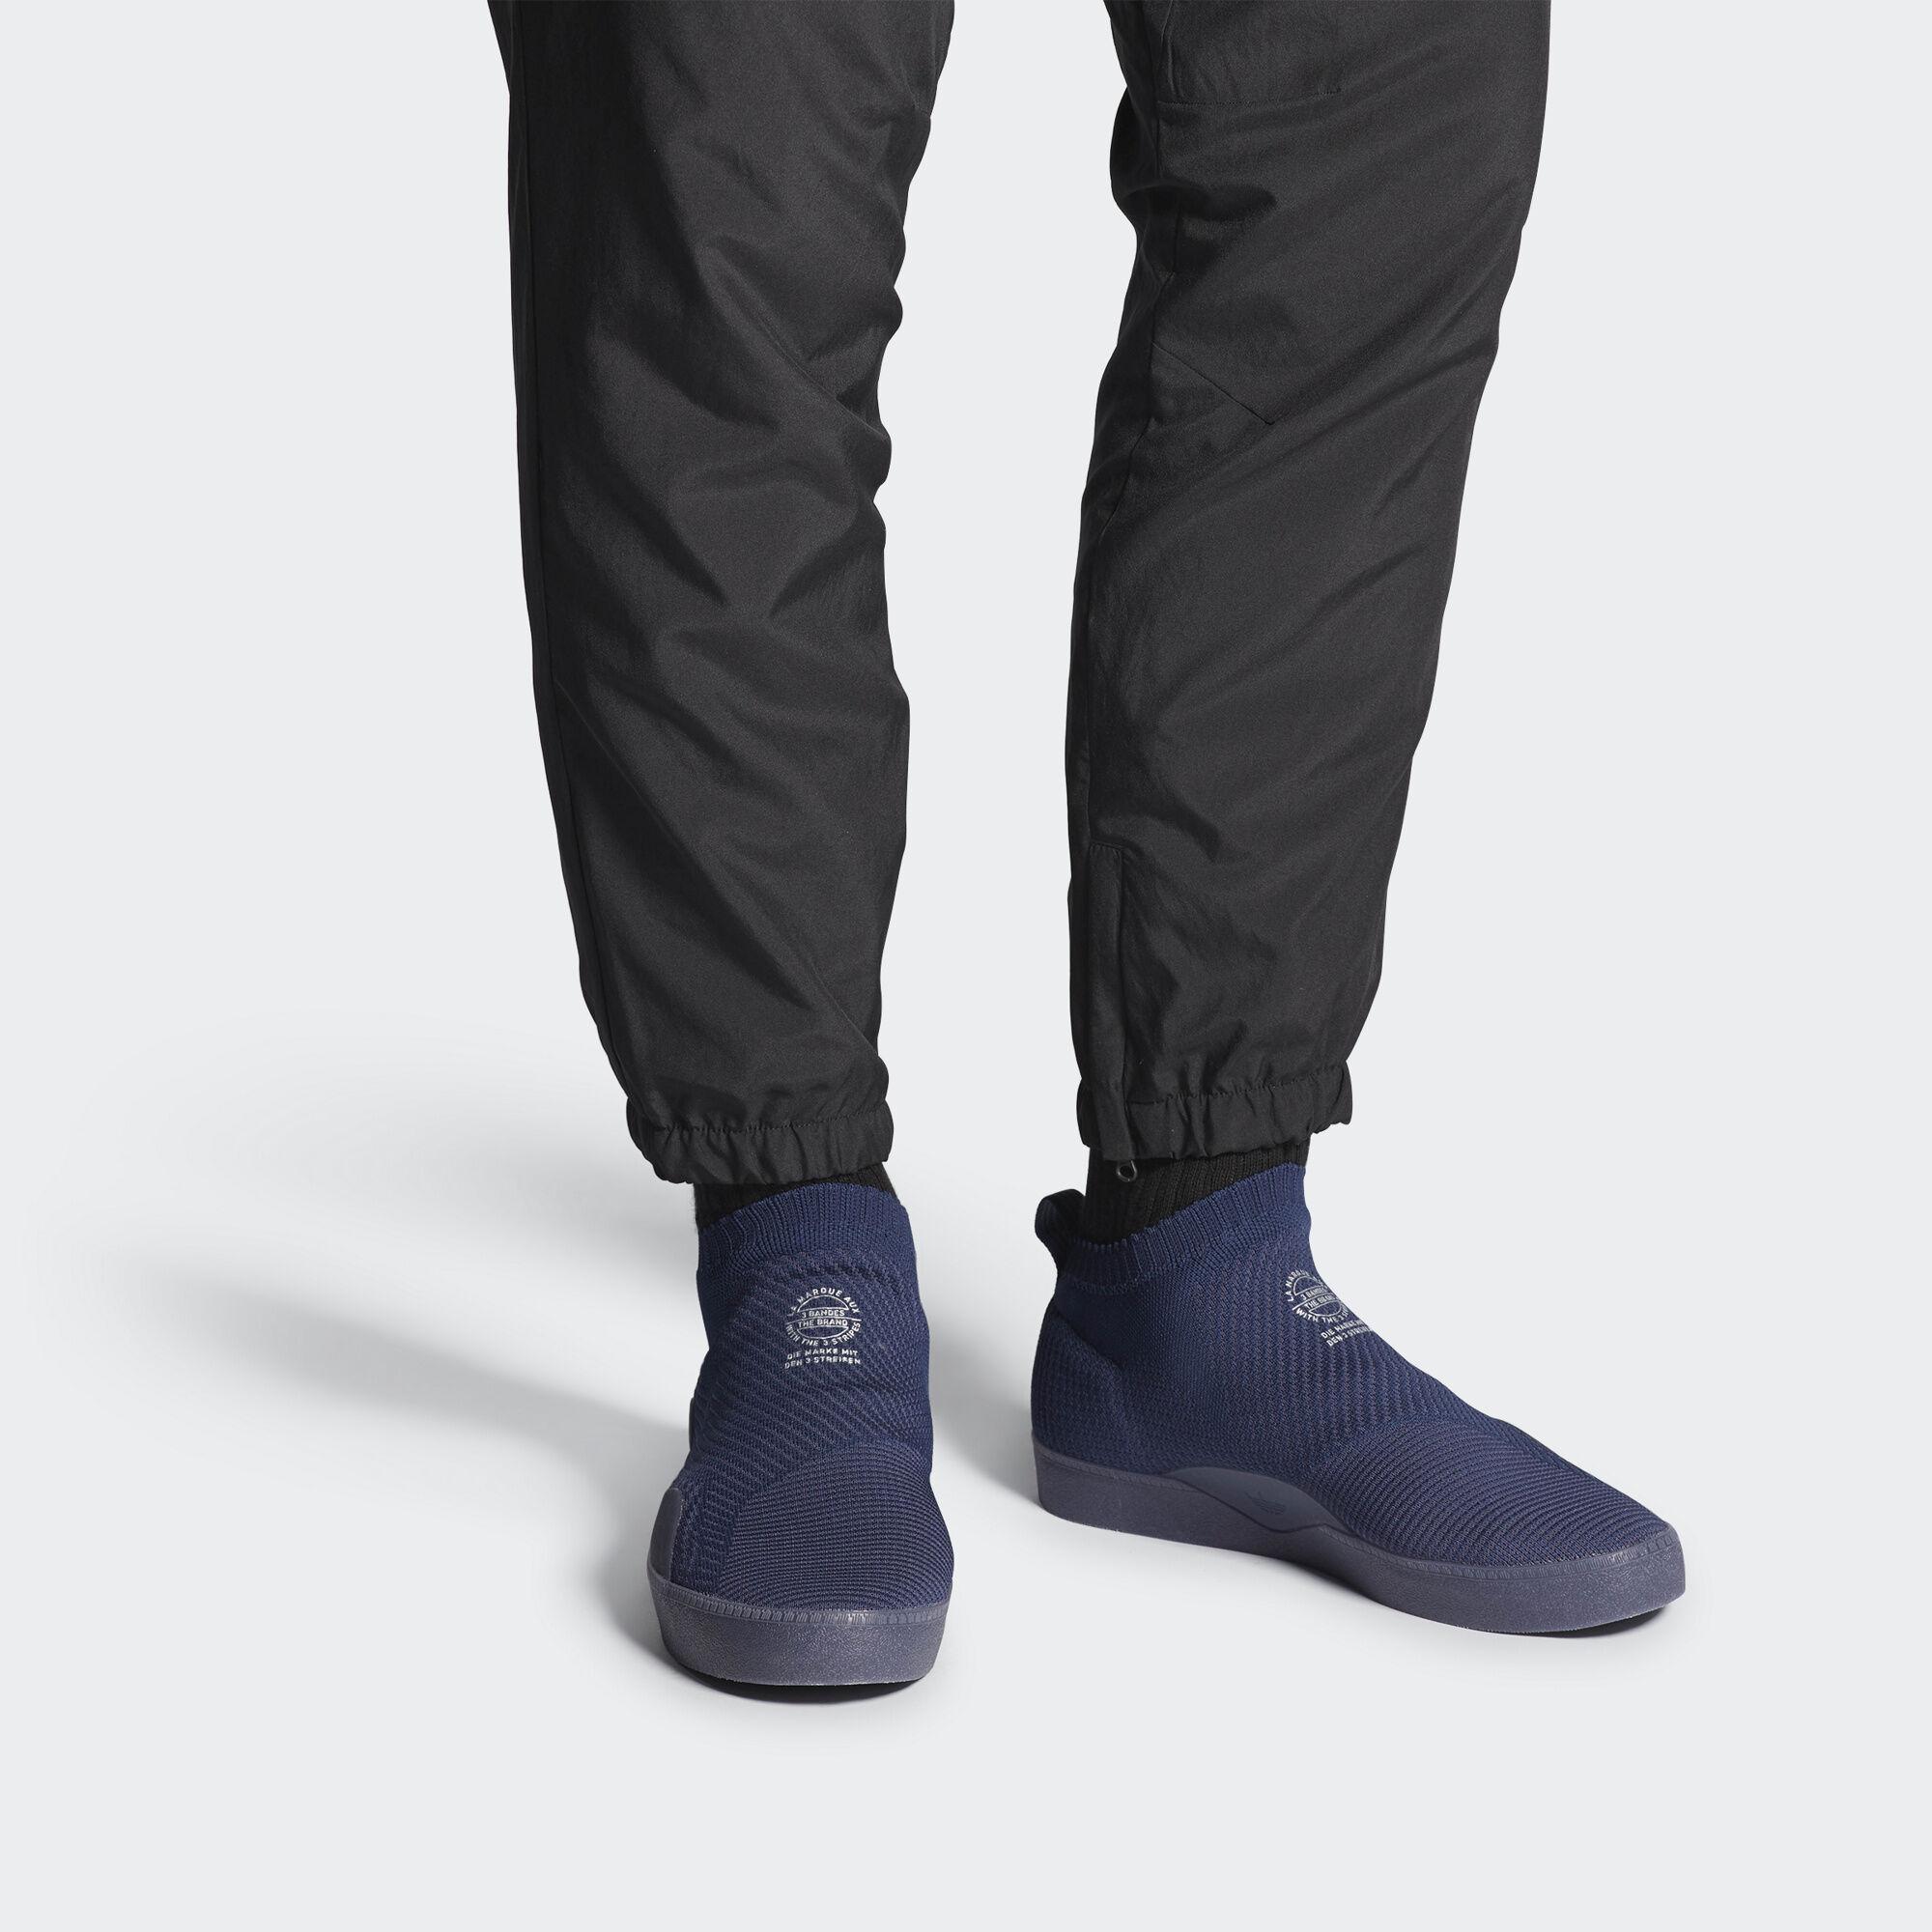 save off a8cff 0f529 adidas 3ST.002 Primeknit Shoes - Grey  adidas Australia